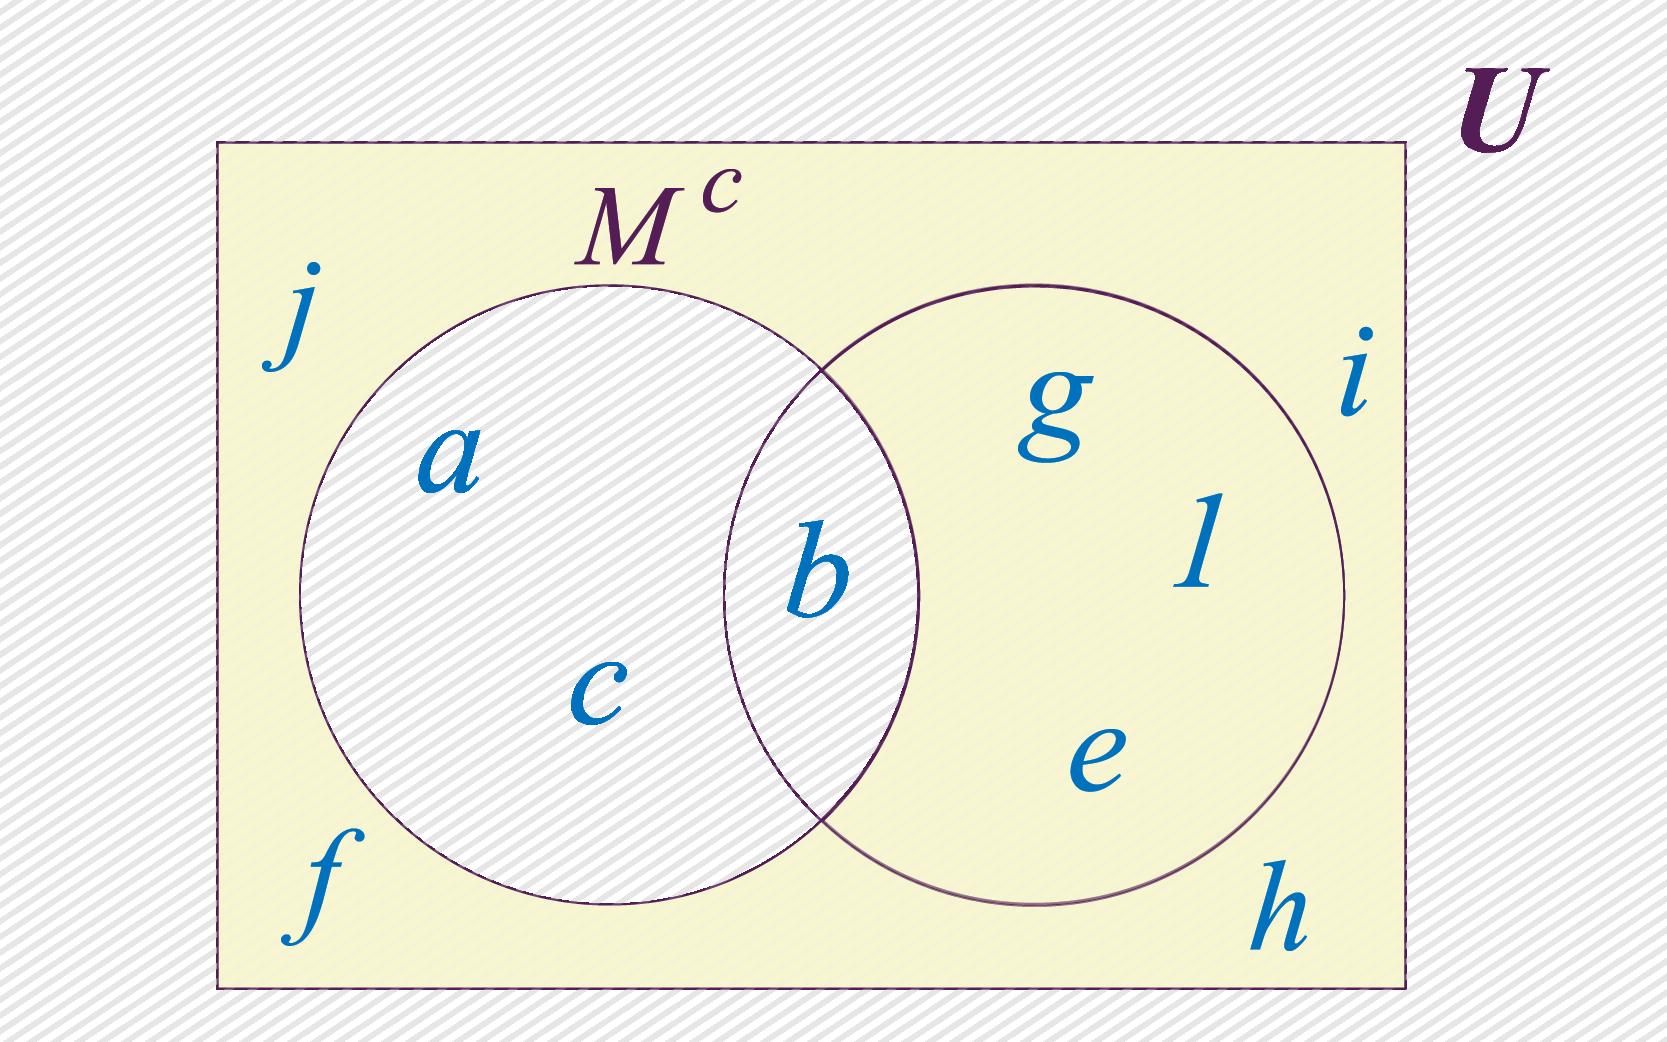 Complemento do conjunto M.